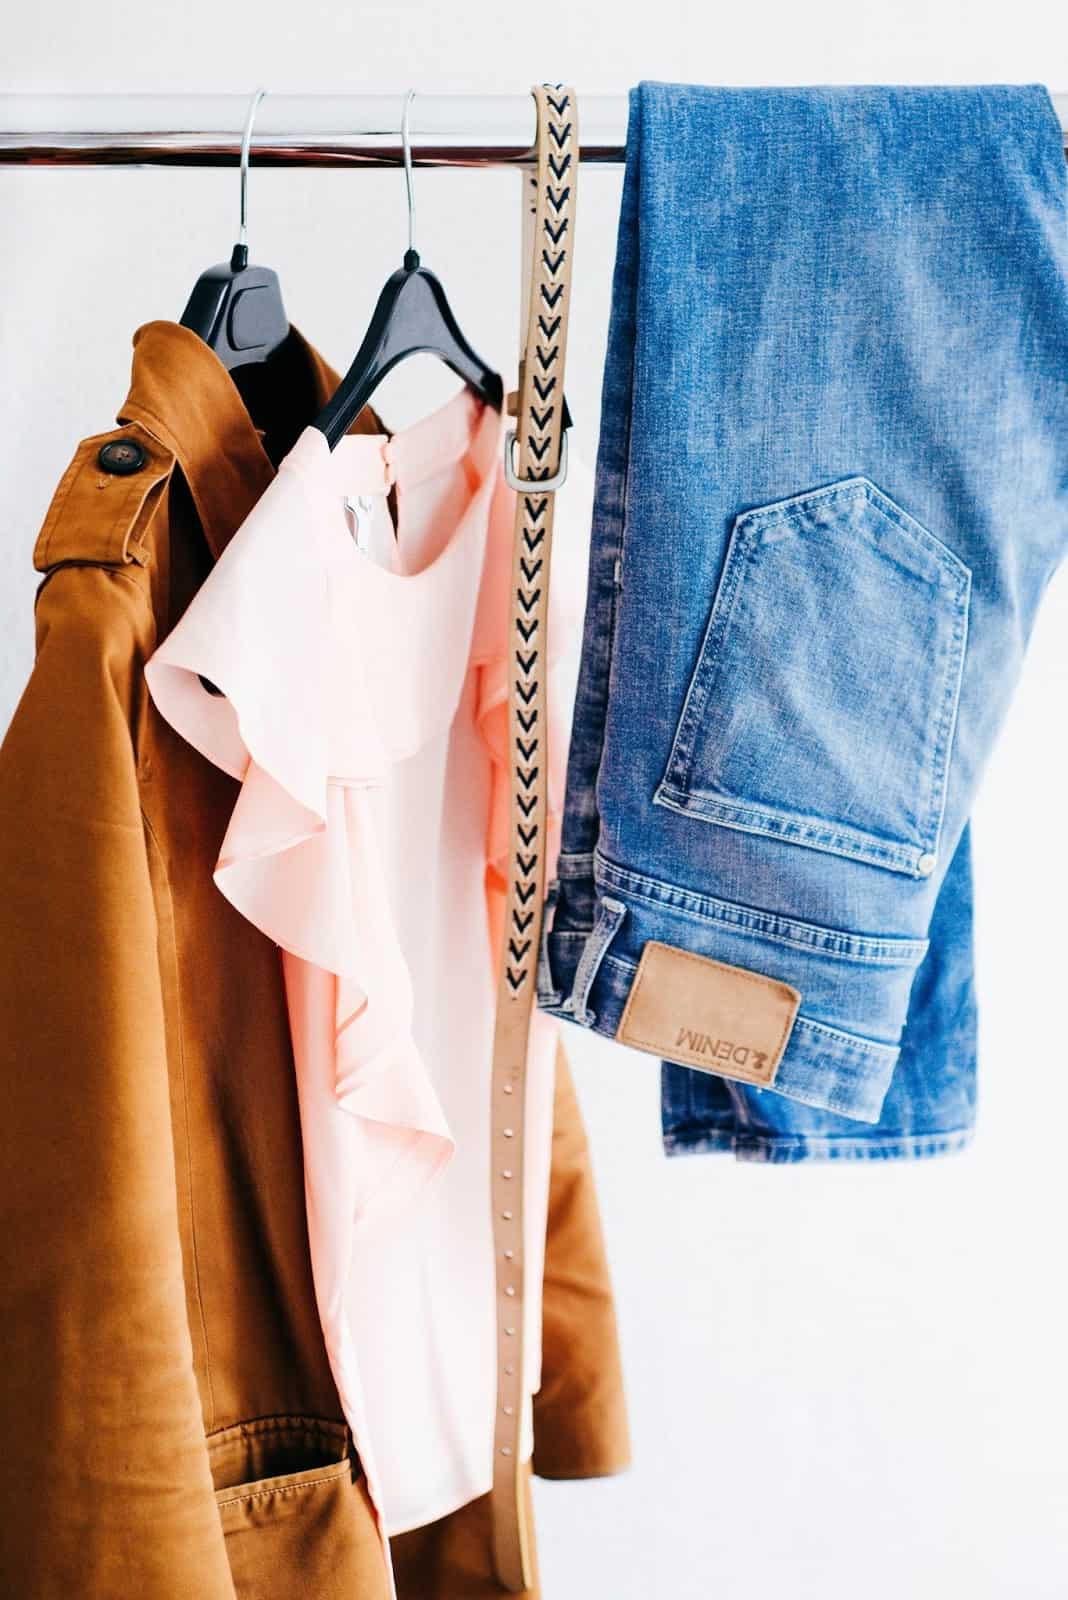 clutter free closet clothing-organization-closet